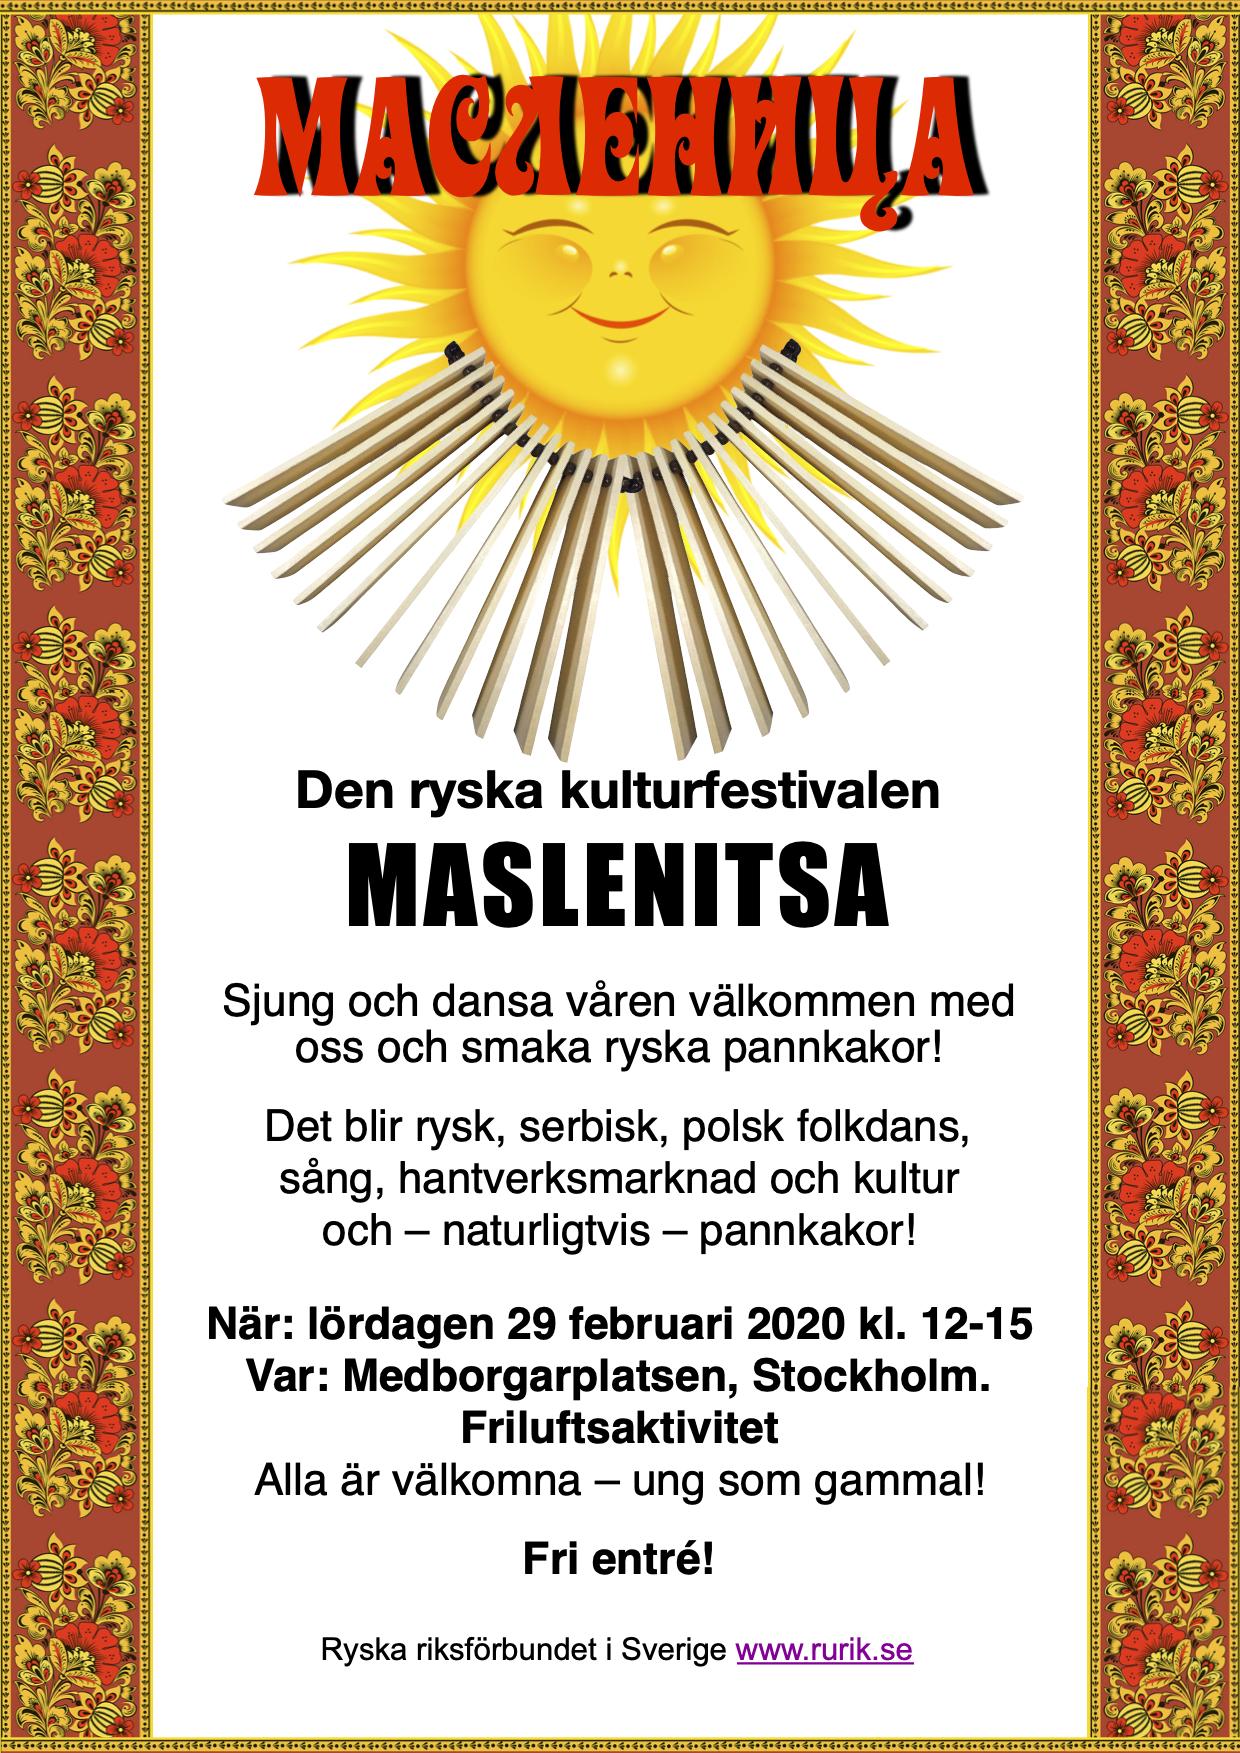 kulturfestivalen 2020 stockholm